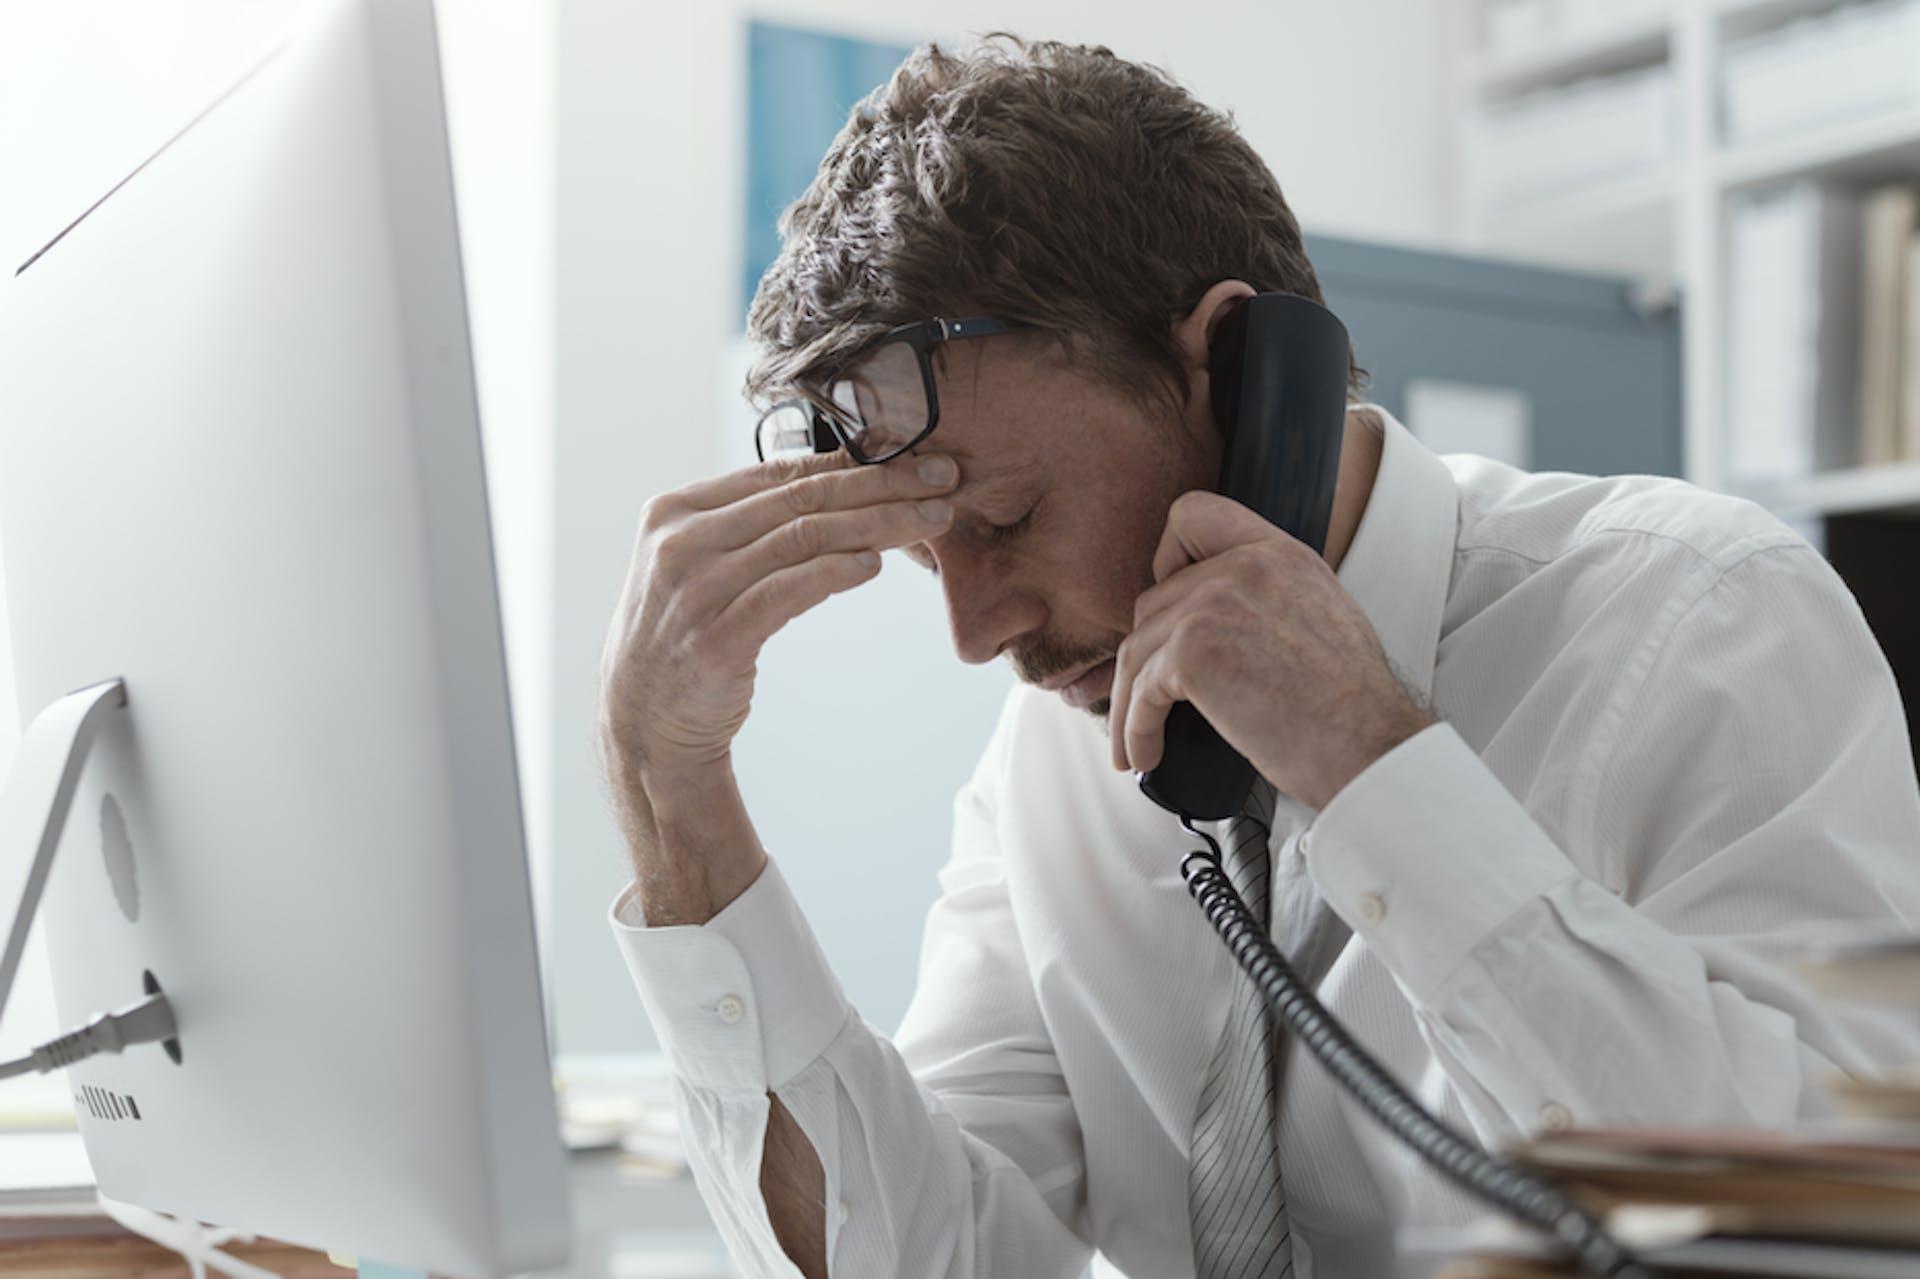 A man using a landline telephone at his work desk